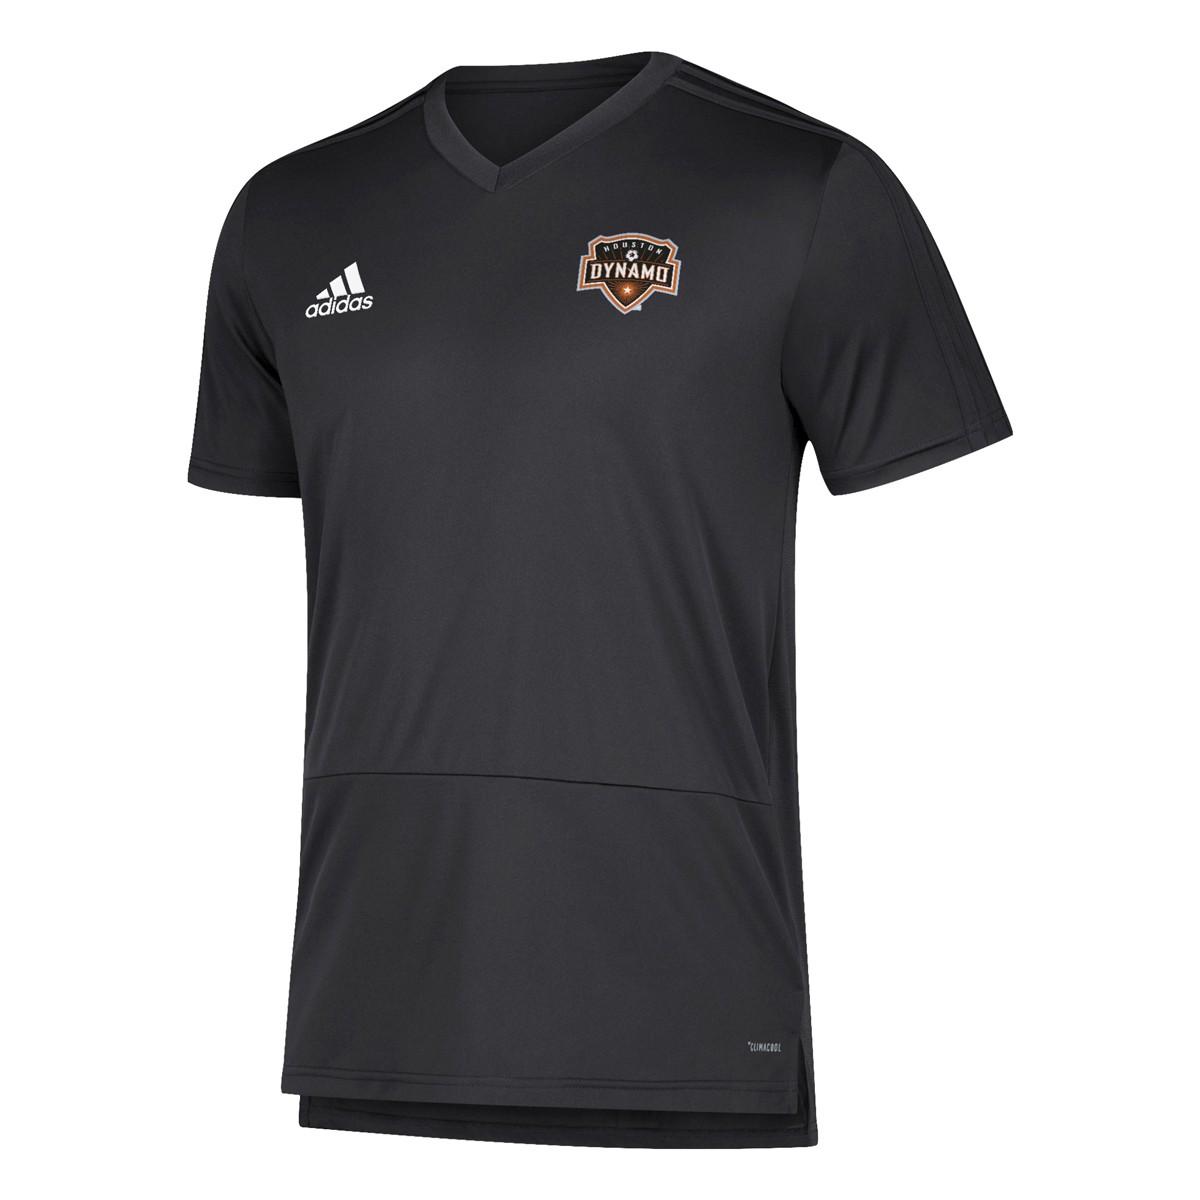 size 40 7f61e e4377 Details about Houston Dynamo MLS Adidas Men's Black Climacool 2018 Training  Jersey